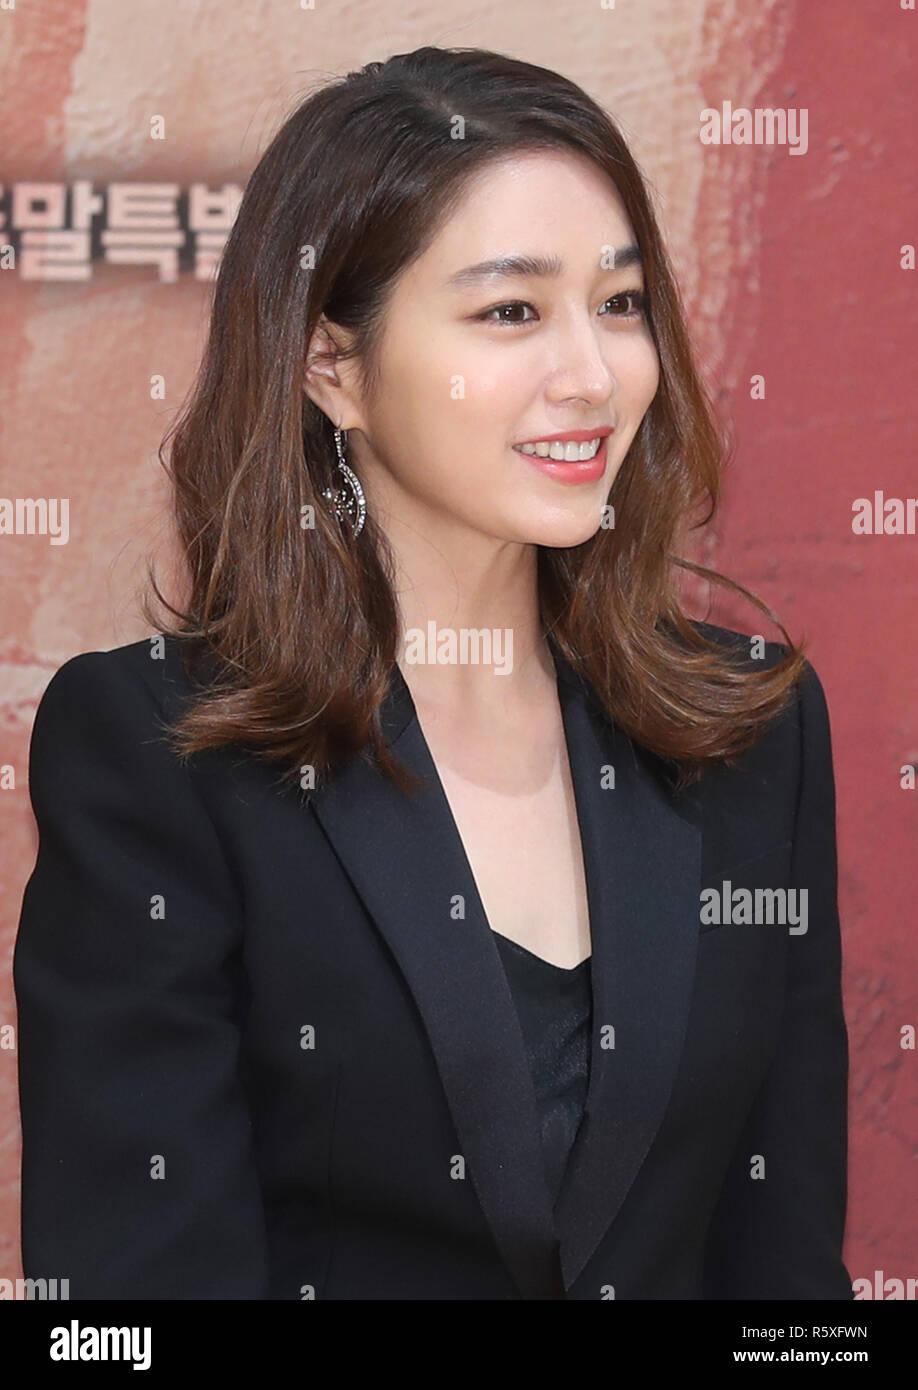 03rd Dec 2018 S Korean Actress Lee Min Jung South Korean